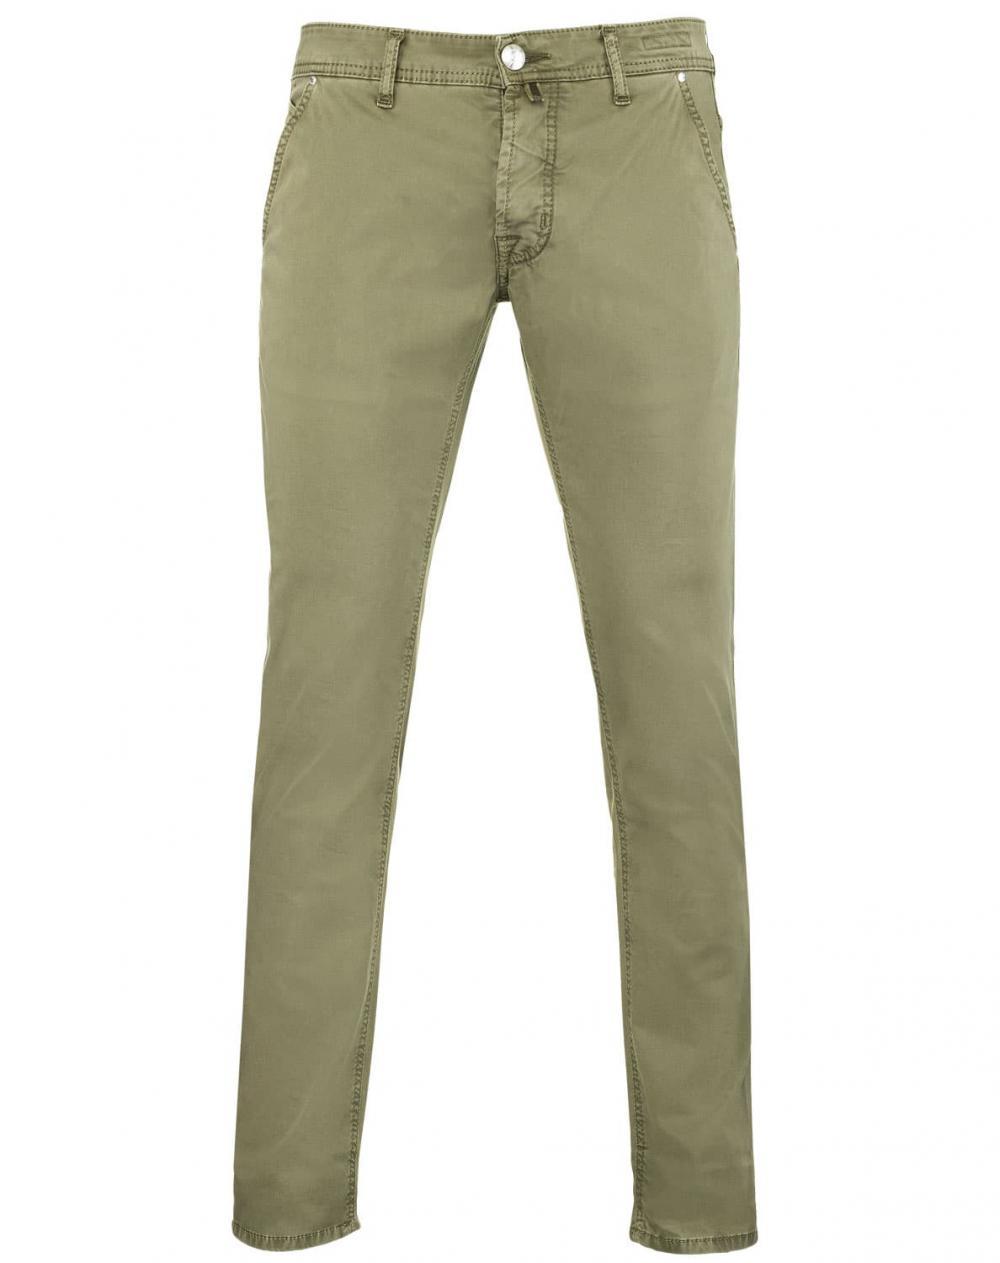 Chino J613 Comfort Vintage